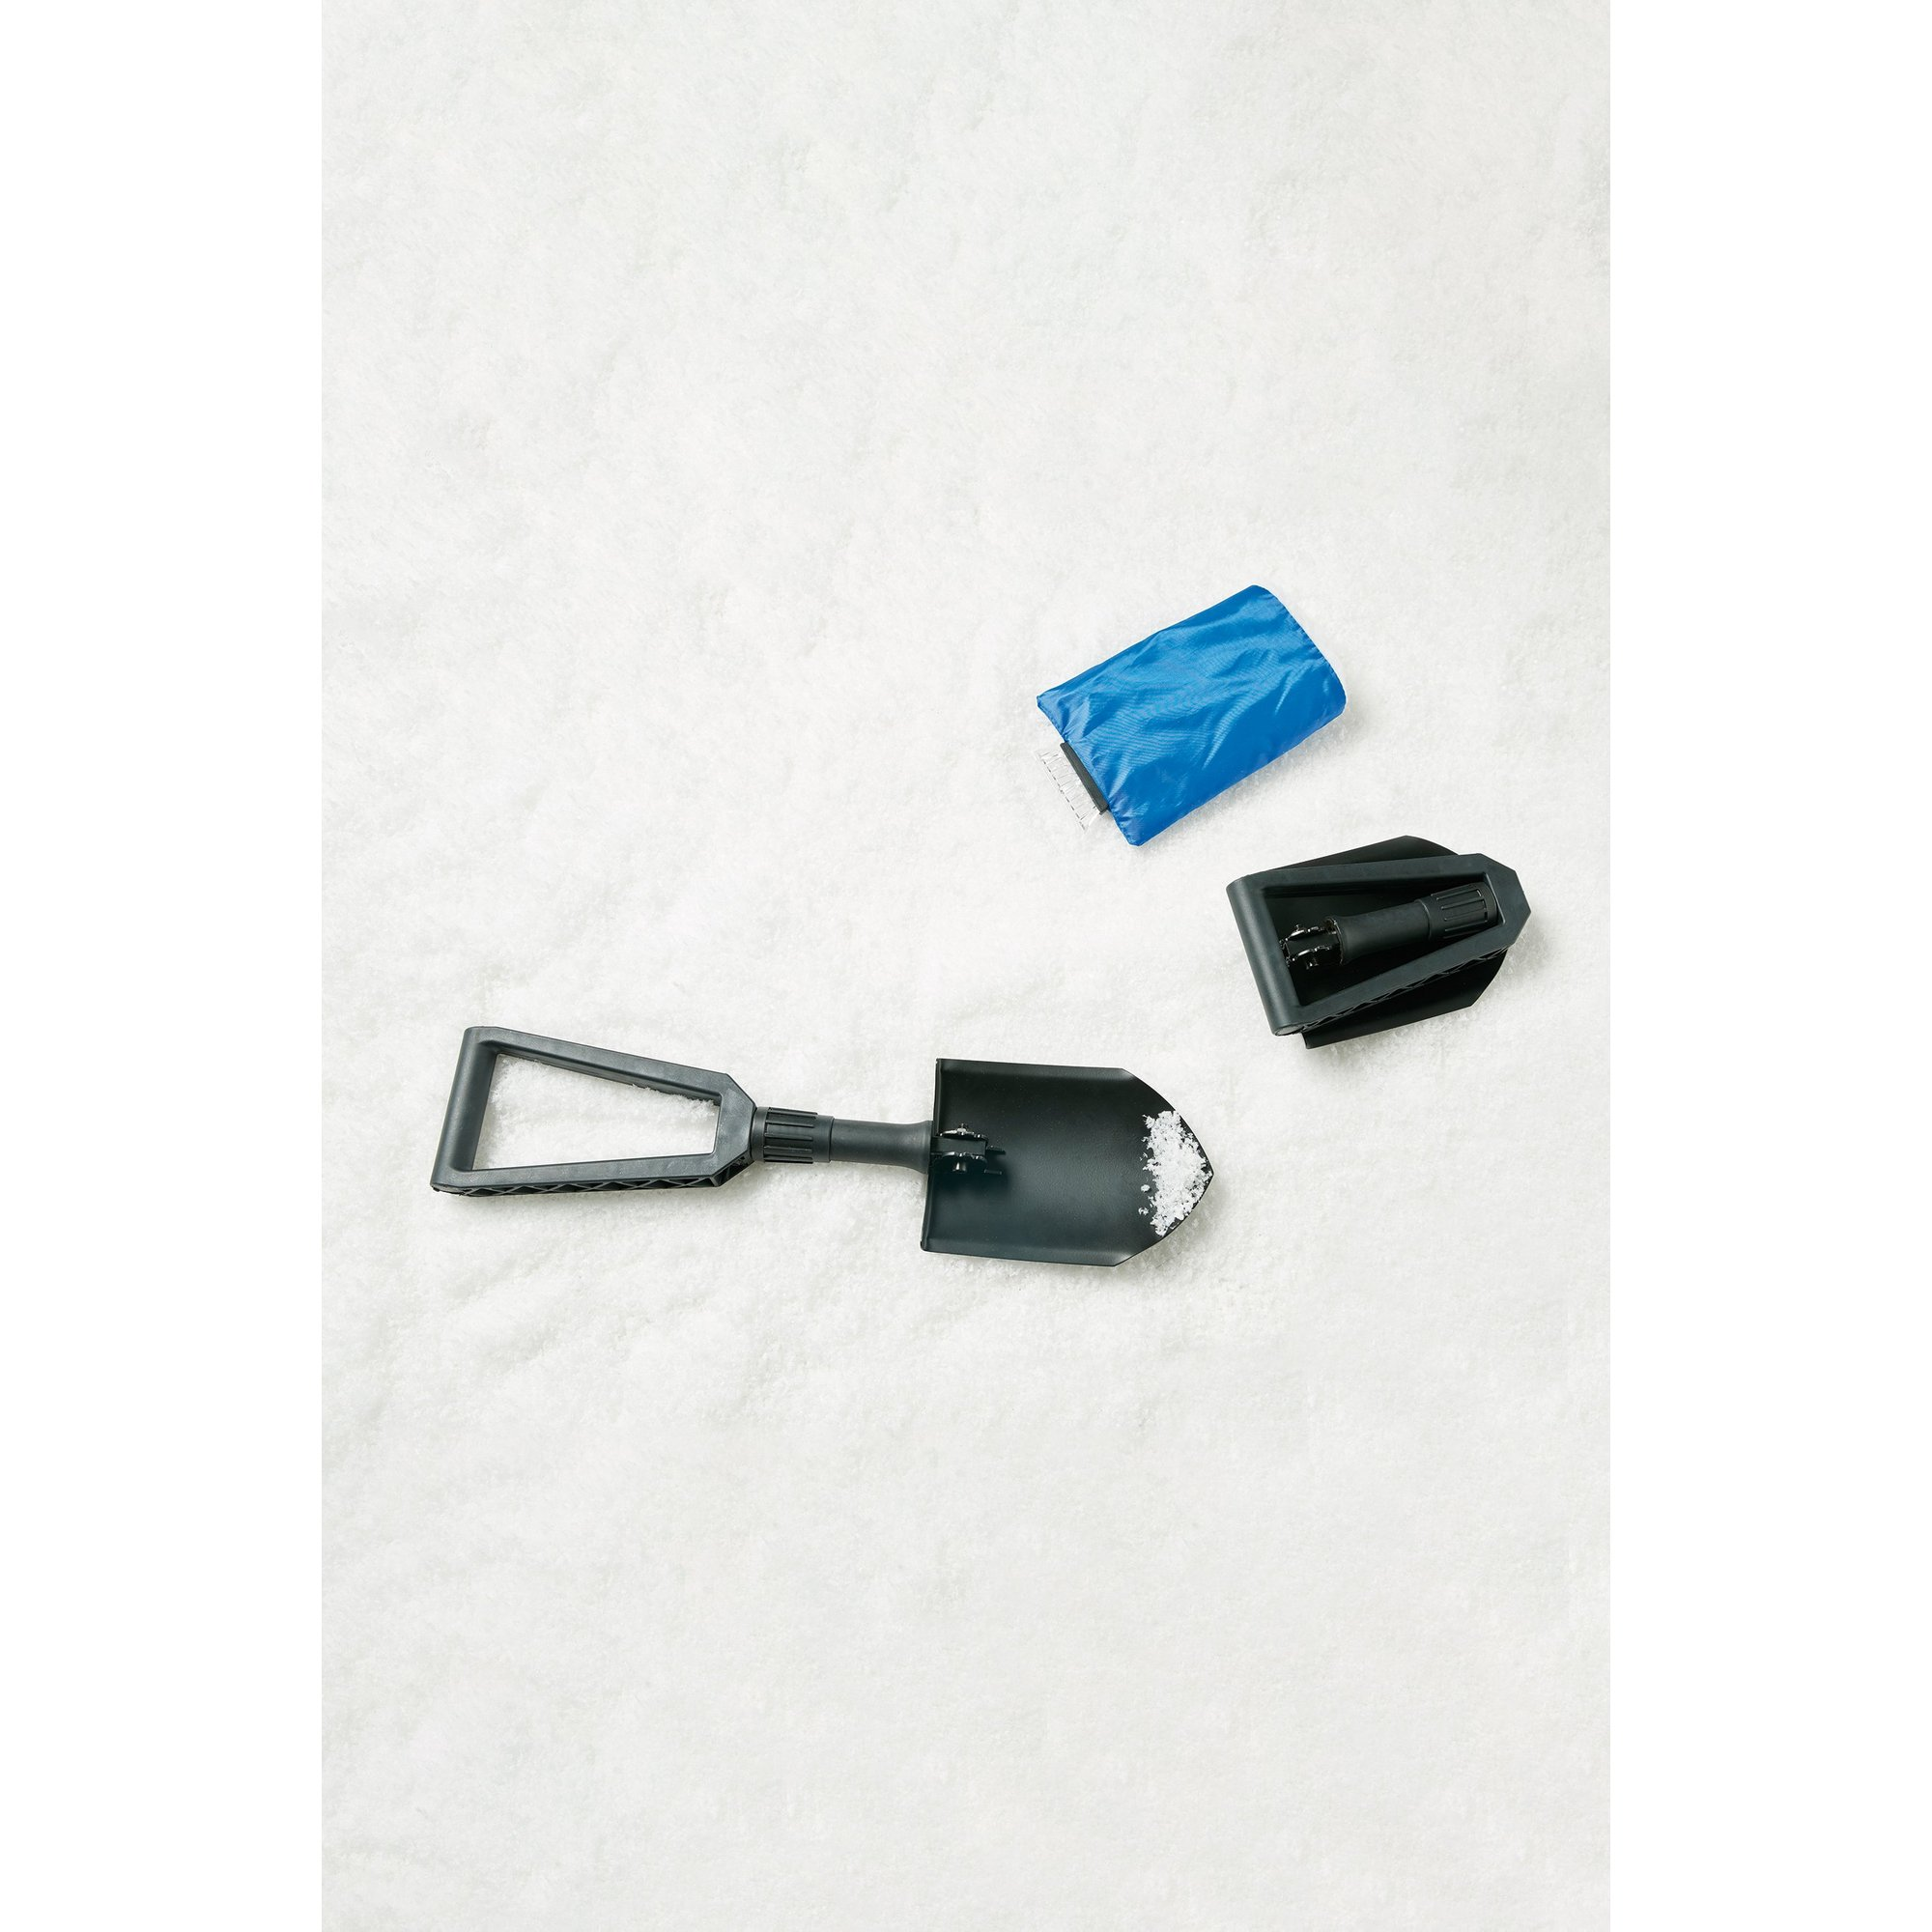 Image of Winter Car Care Kit